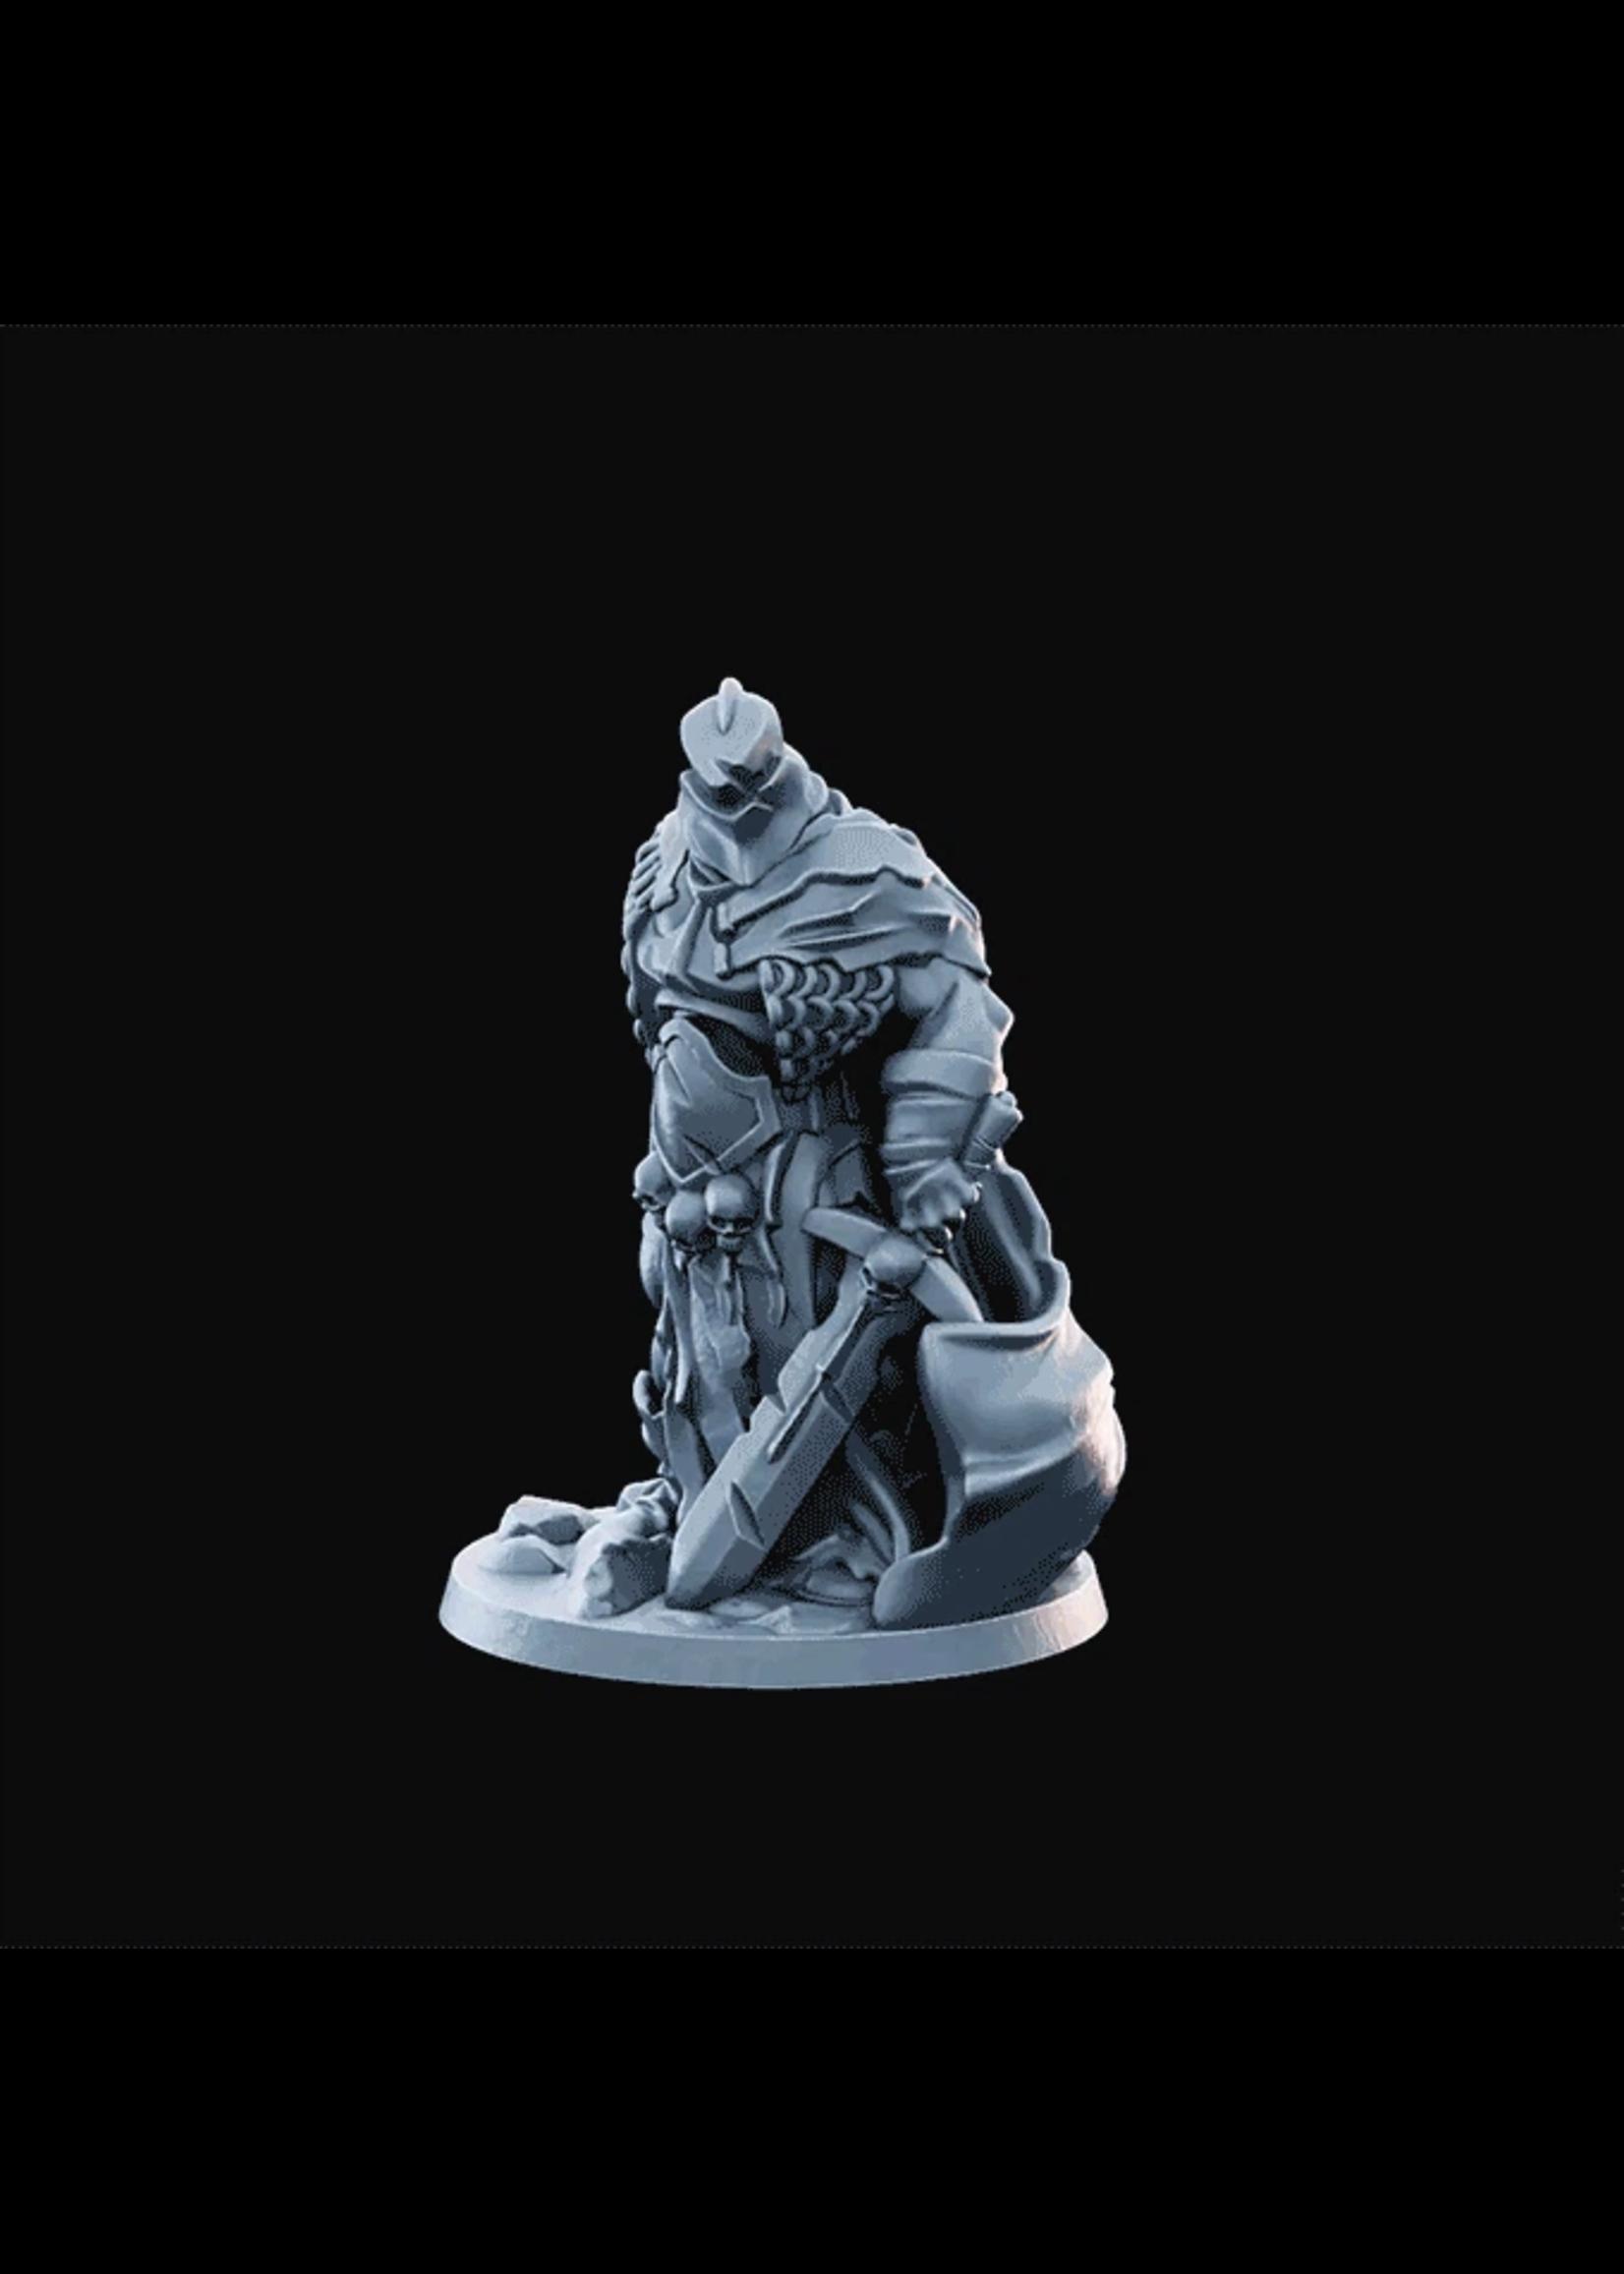 3D Printed Miniature - Fallenknight  - Dungeons & Dragons - Desolate Plains KS